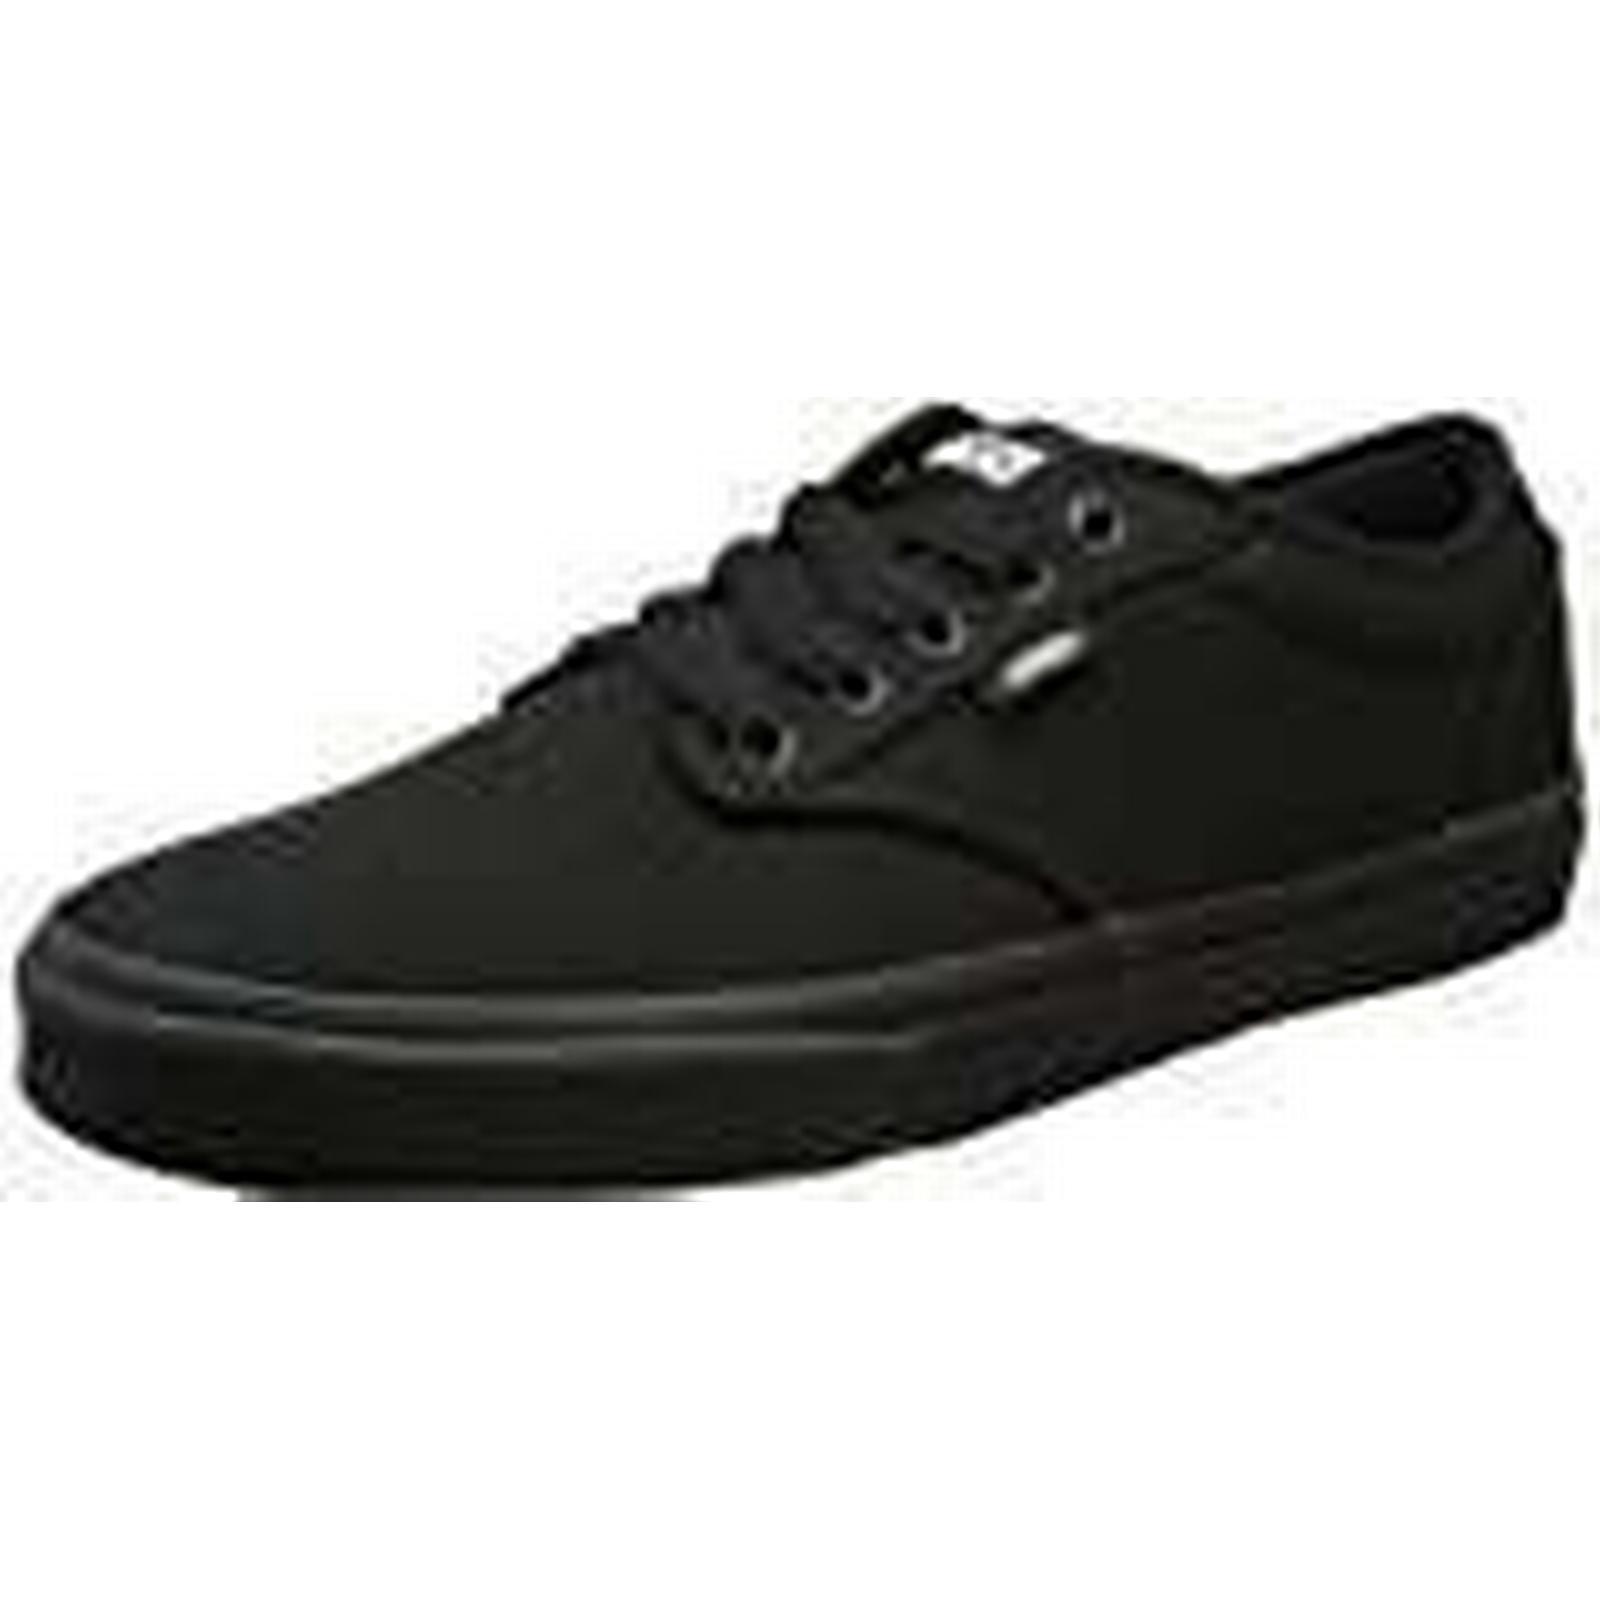 Vans Atwood, Men's UK Skateboarding Shoes, Black, 7.5 UK Men's / 41 EU 7580c7